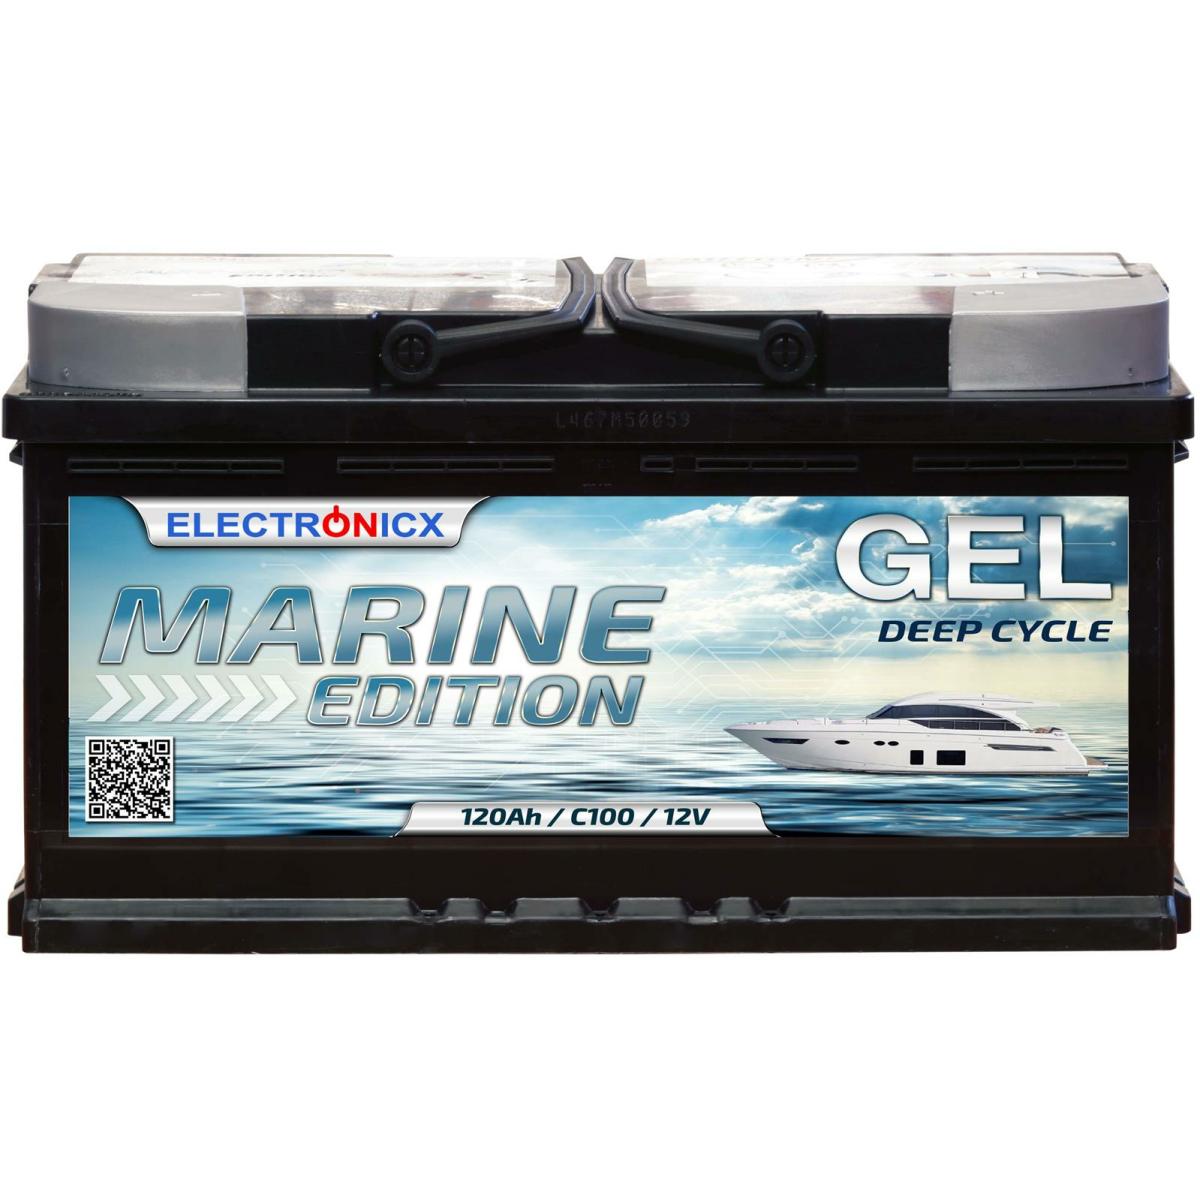 Electronicx Marine Edition Gel Batterie 120 AH 12V Boot Schiff Versorgungsbatterie